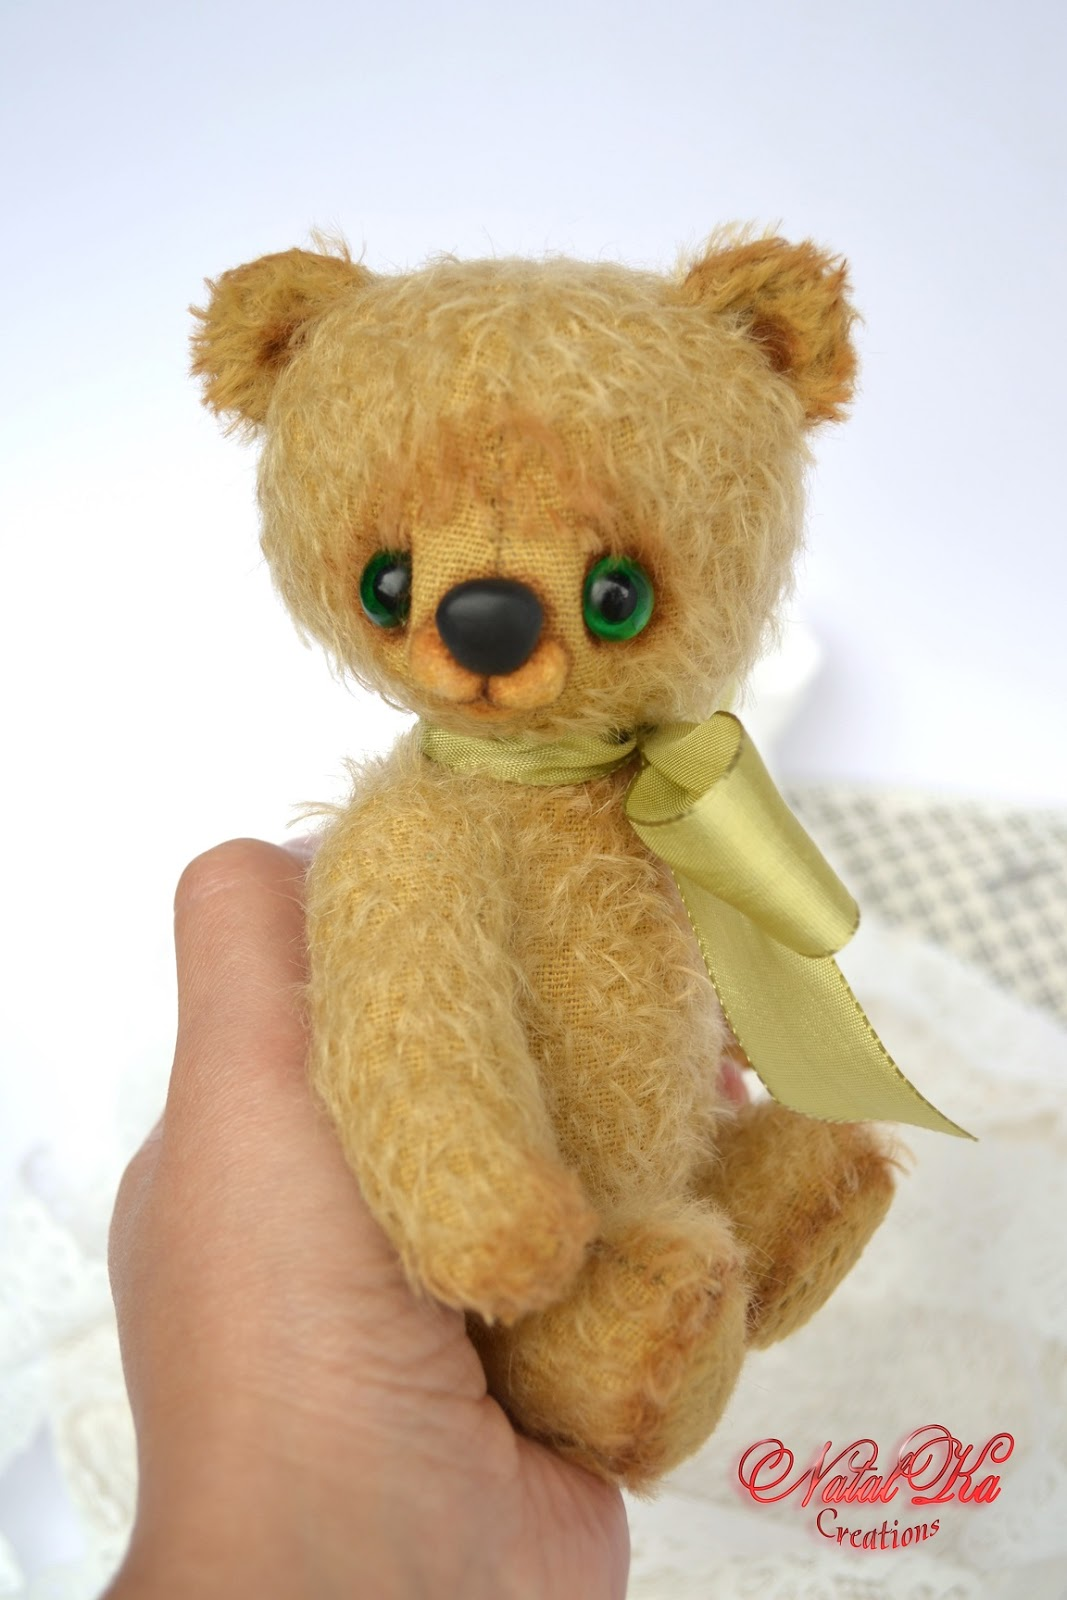 Künstlerbär Teddybär Teddy handgefertigt aus Mohair von NatalKa Creations. Авторский мишка медвежонок медведь тедди ручной работы из мохера от NatalKa Creations